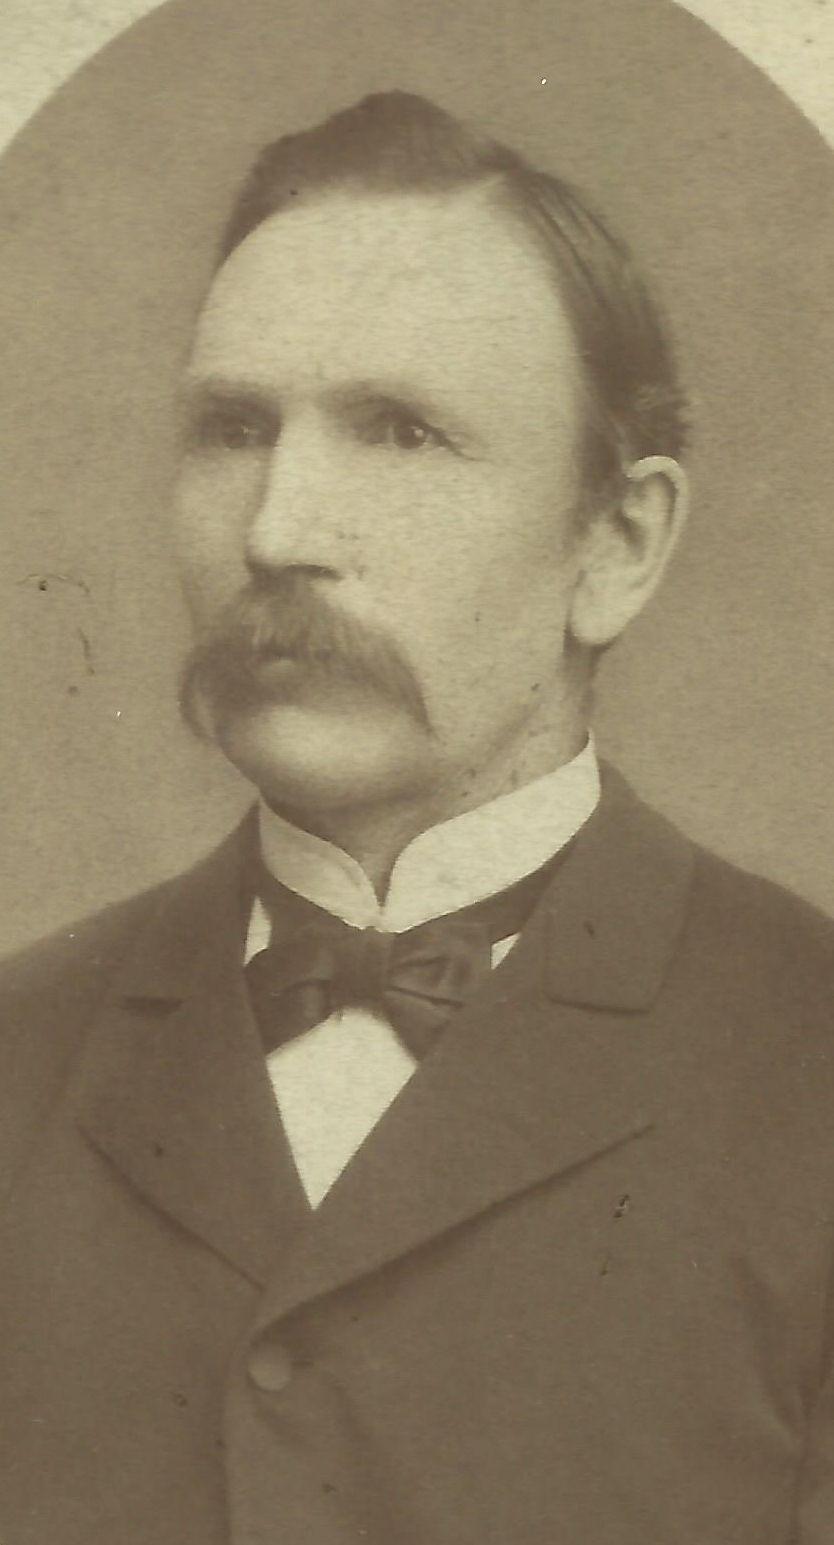 Christensen, Mads Frederick Theobald